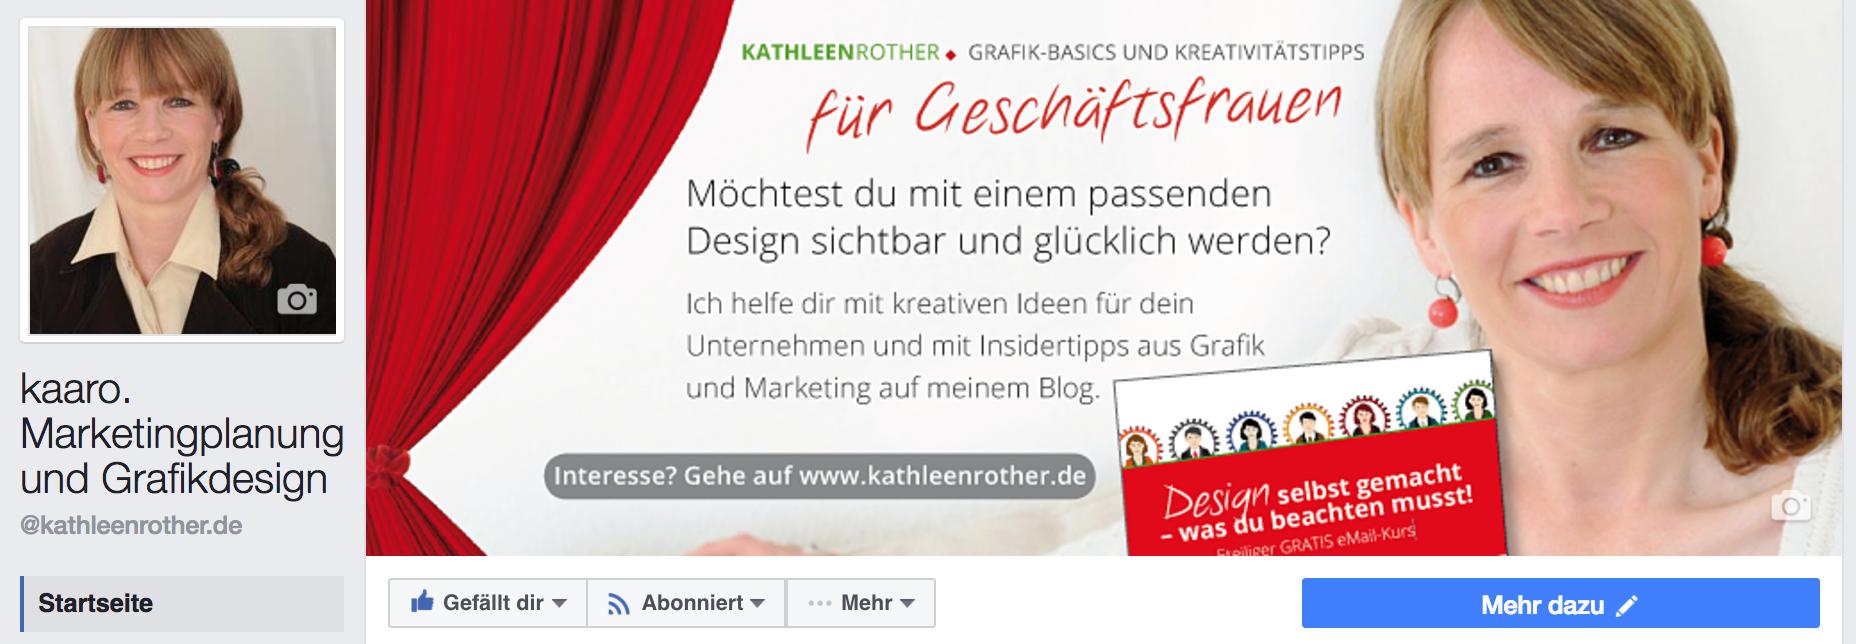 fb-Titel-Kathleen-Rother